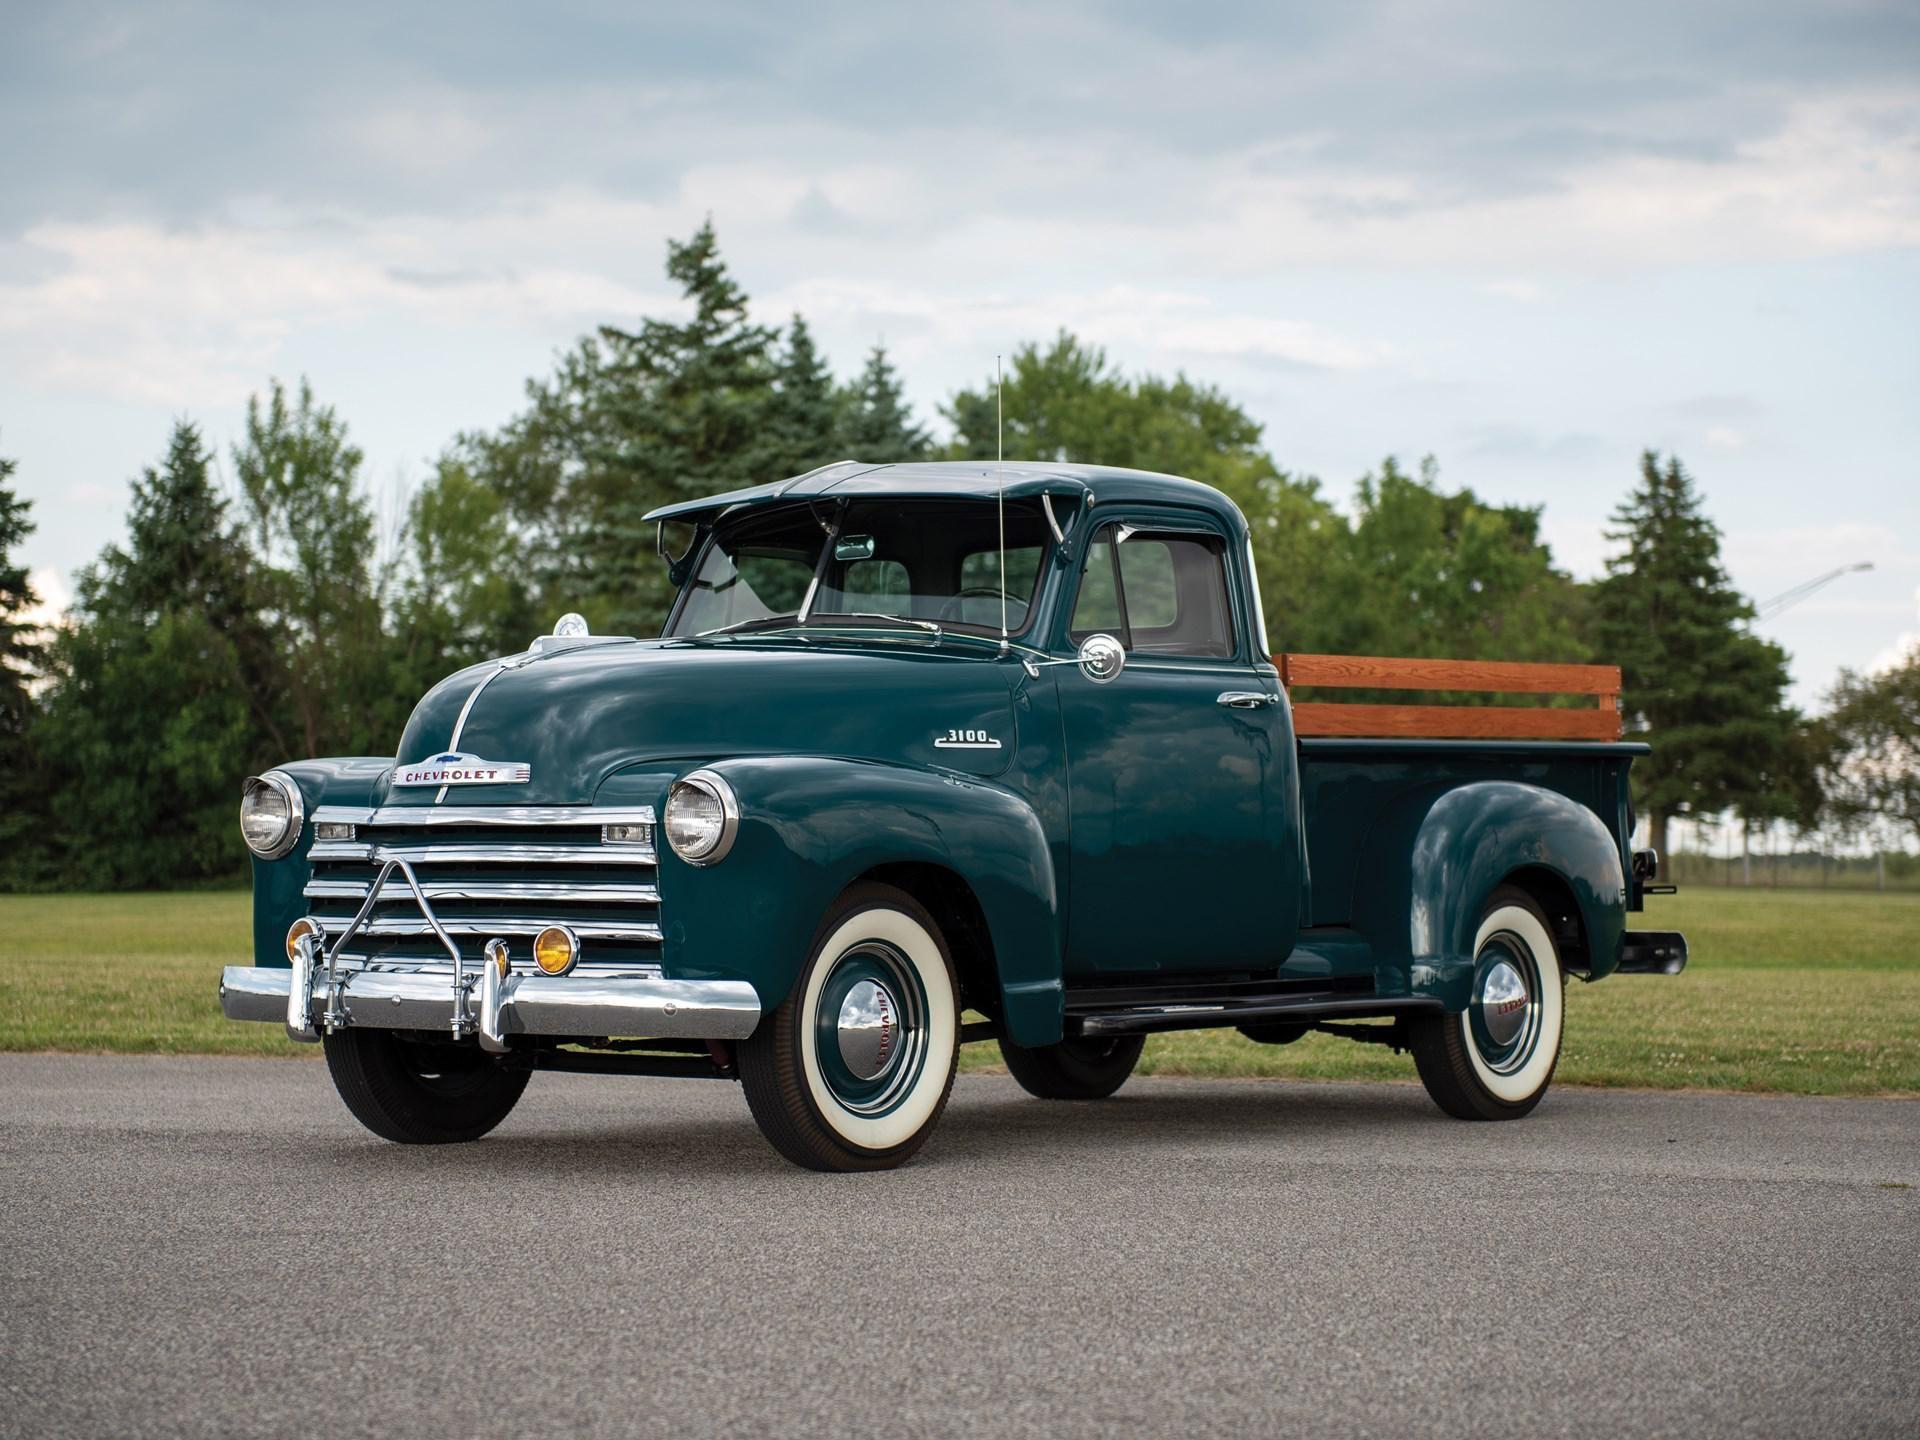 1953 Chevrolet 3100 Five-Window Pickup